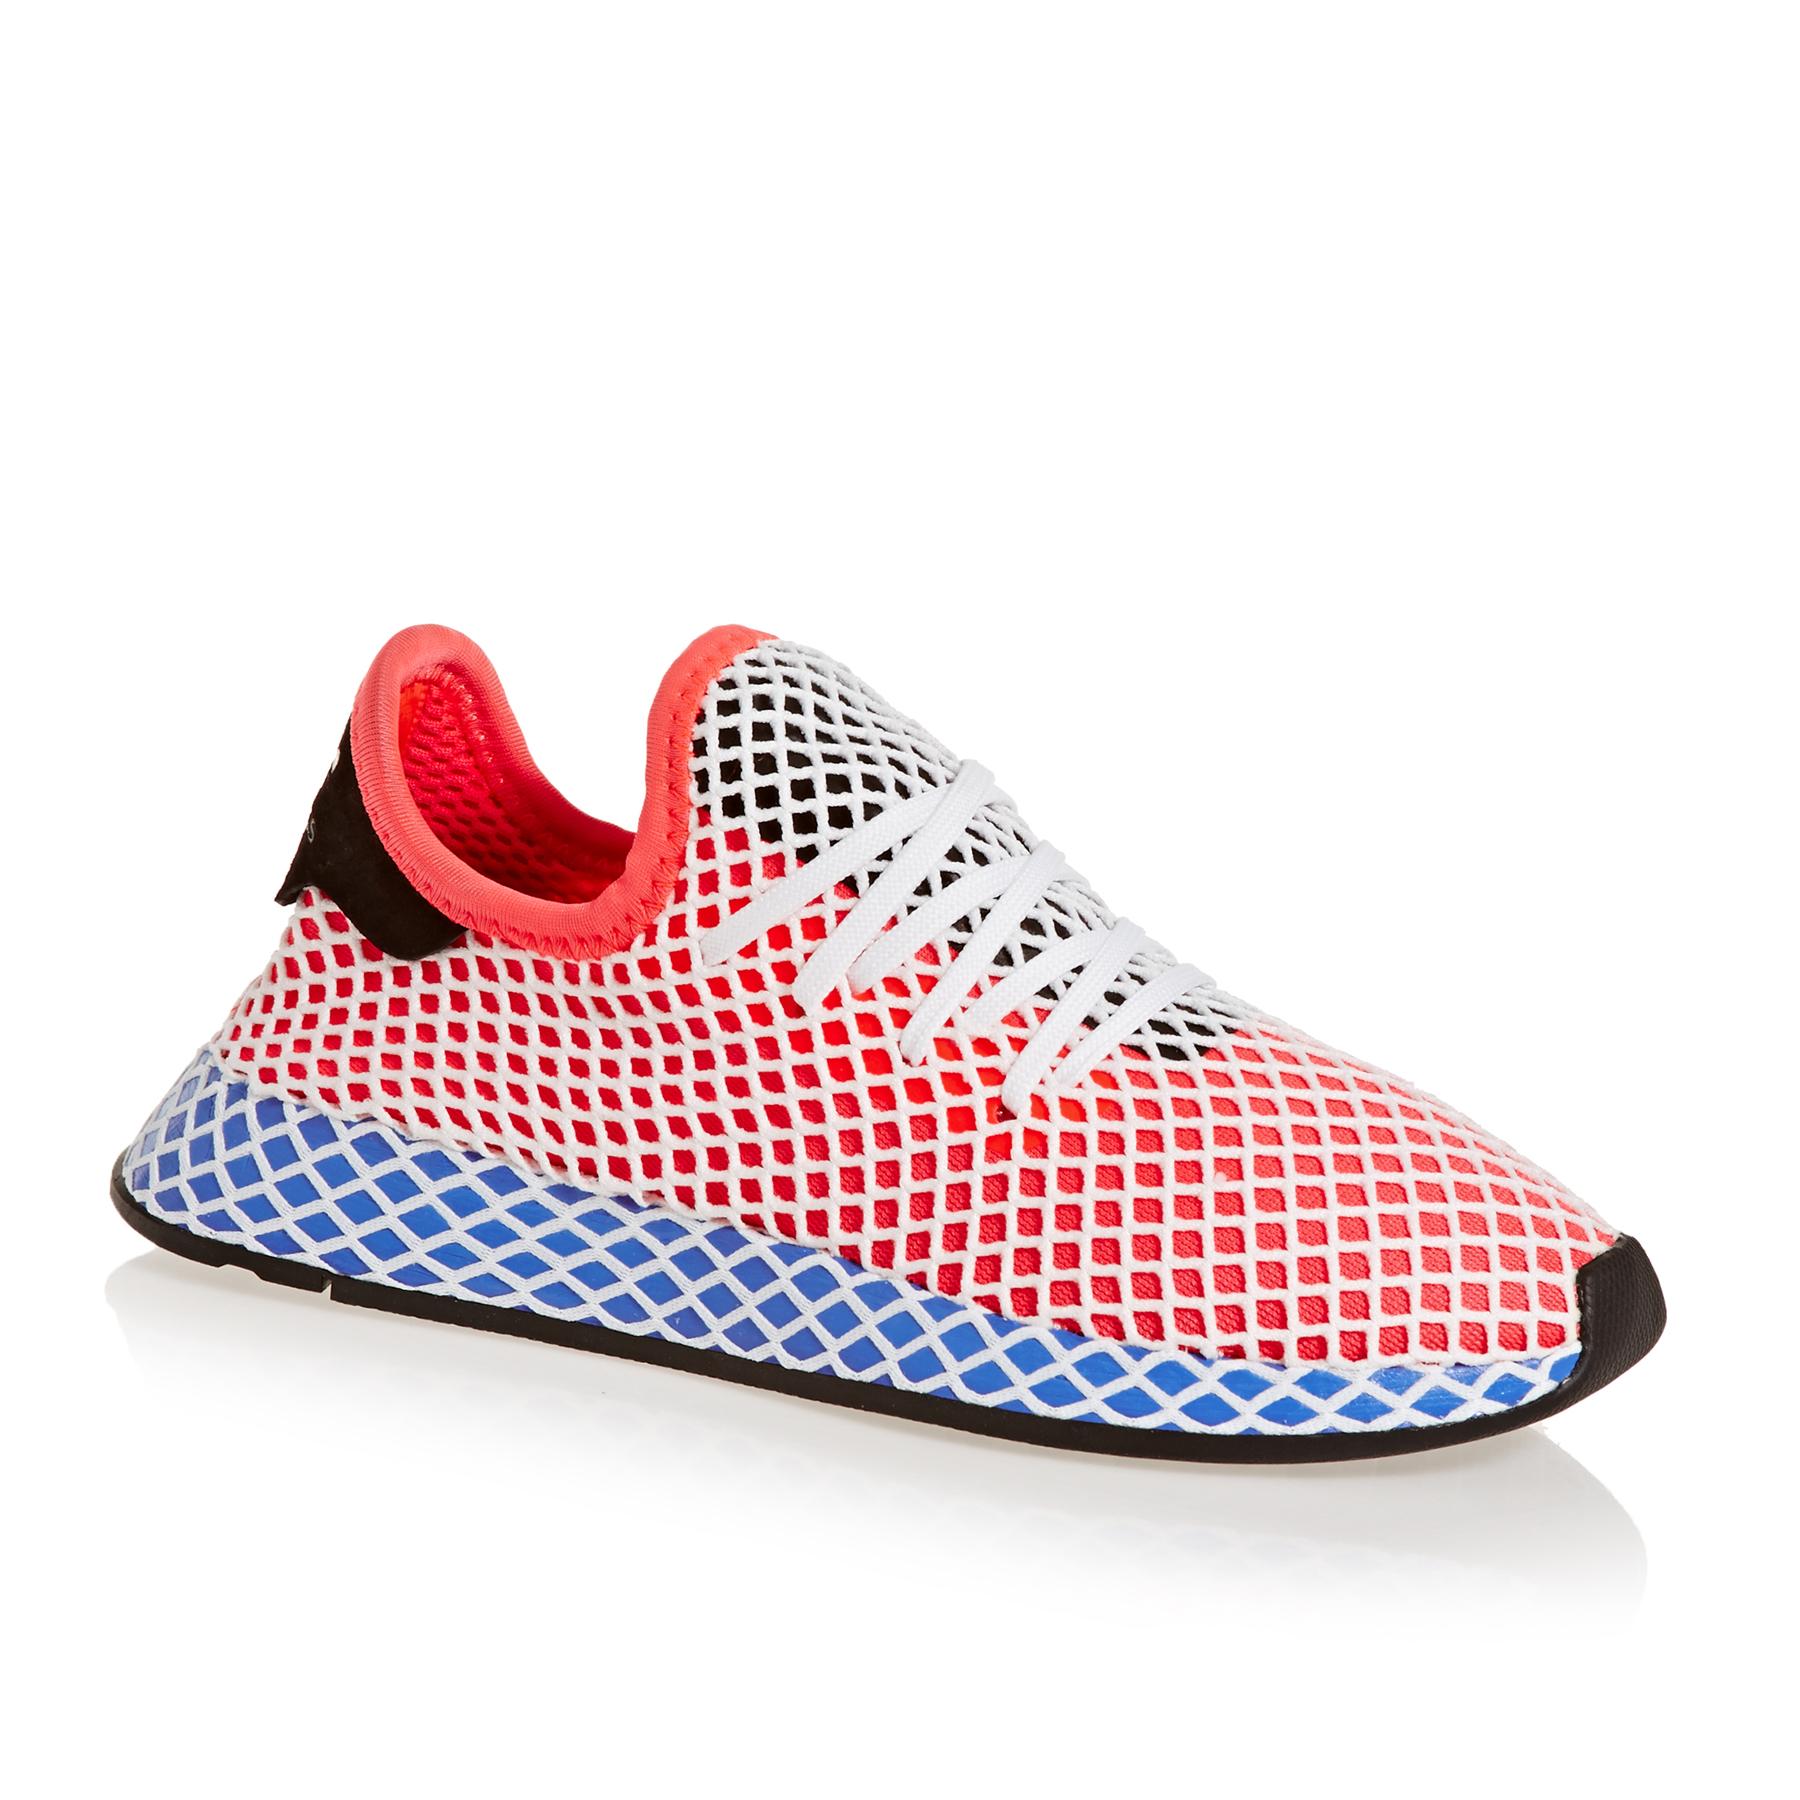 Adidas SchuheKostenlose Deerupt Runner Jungen Originals odCxeB